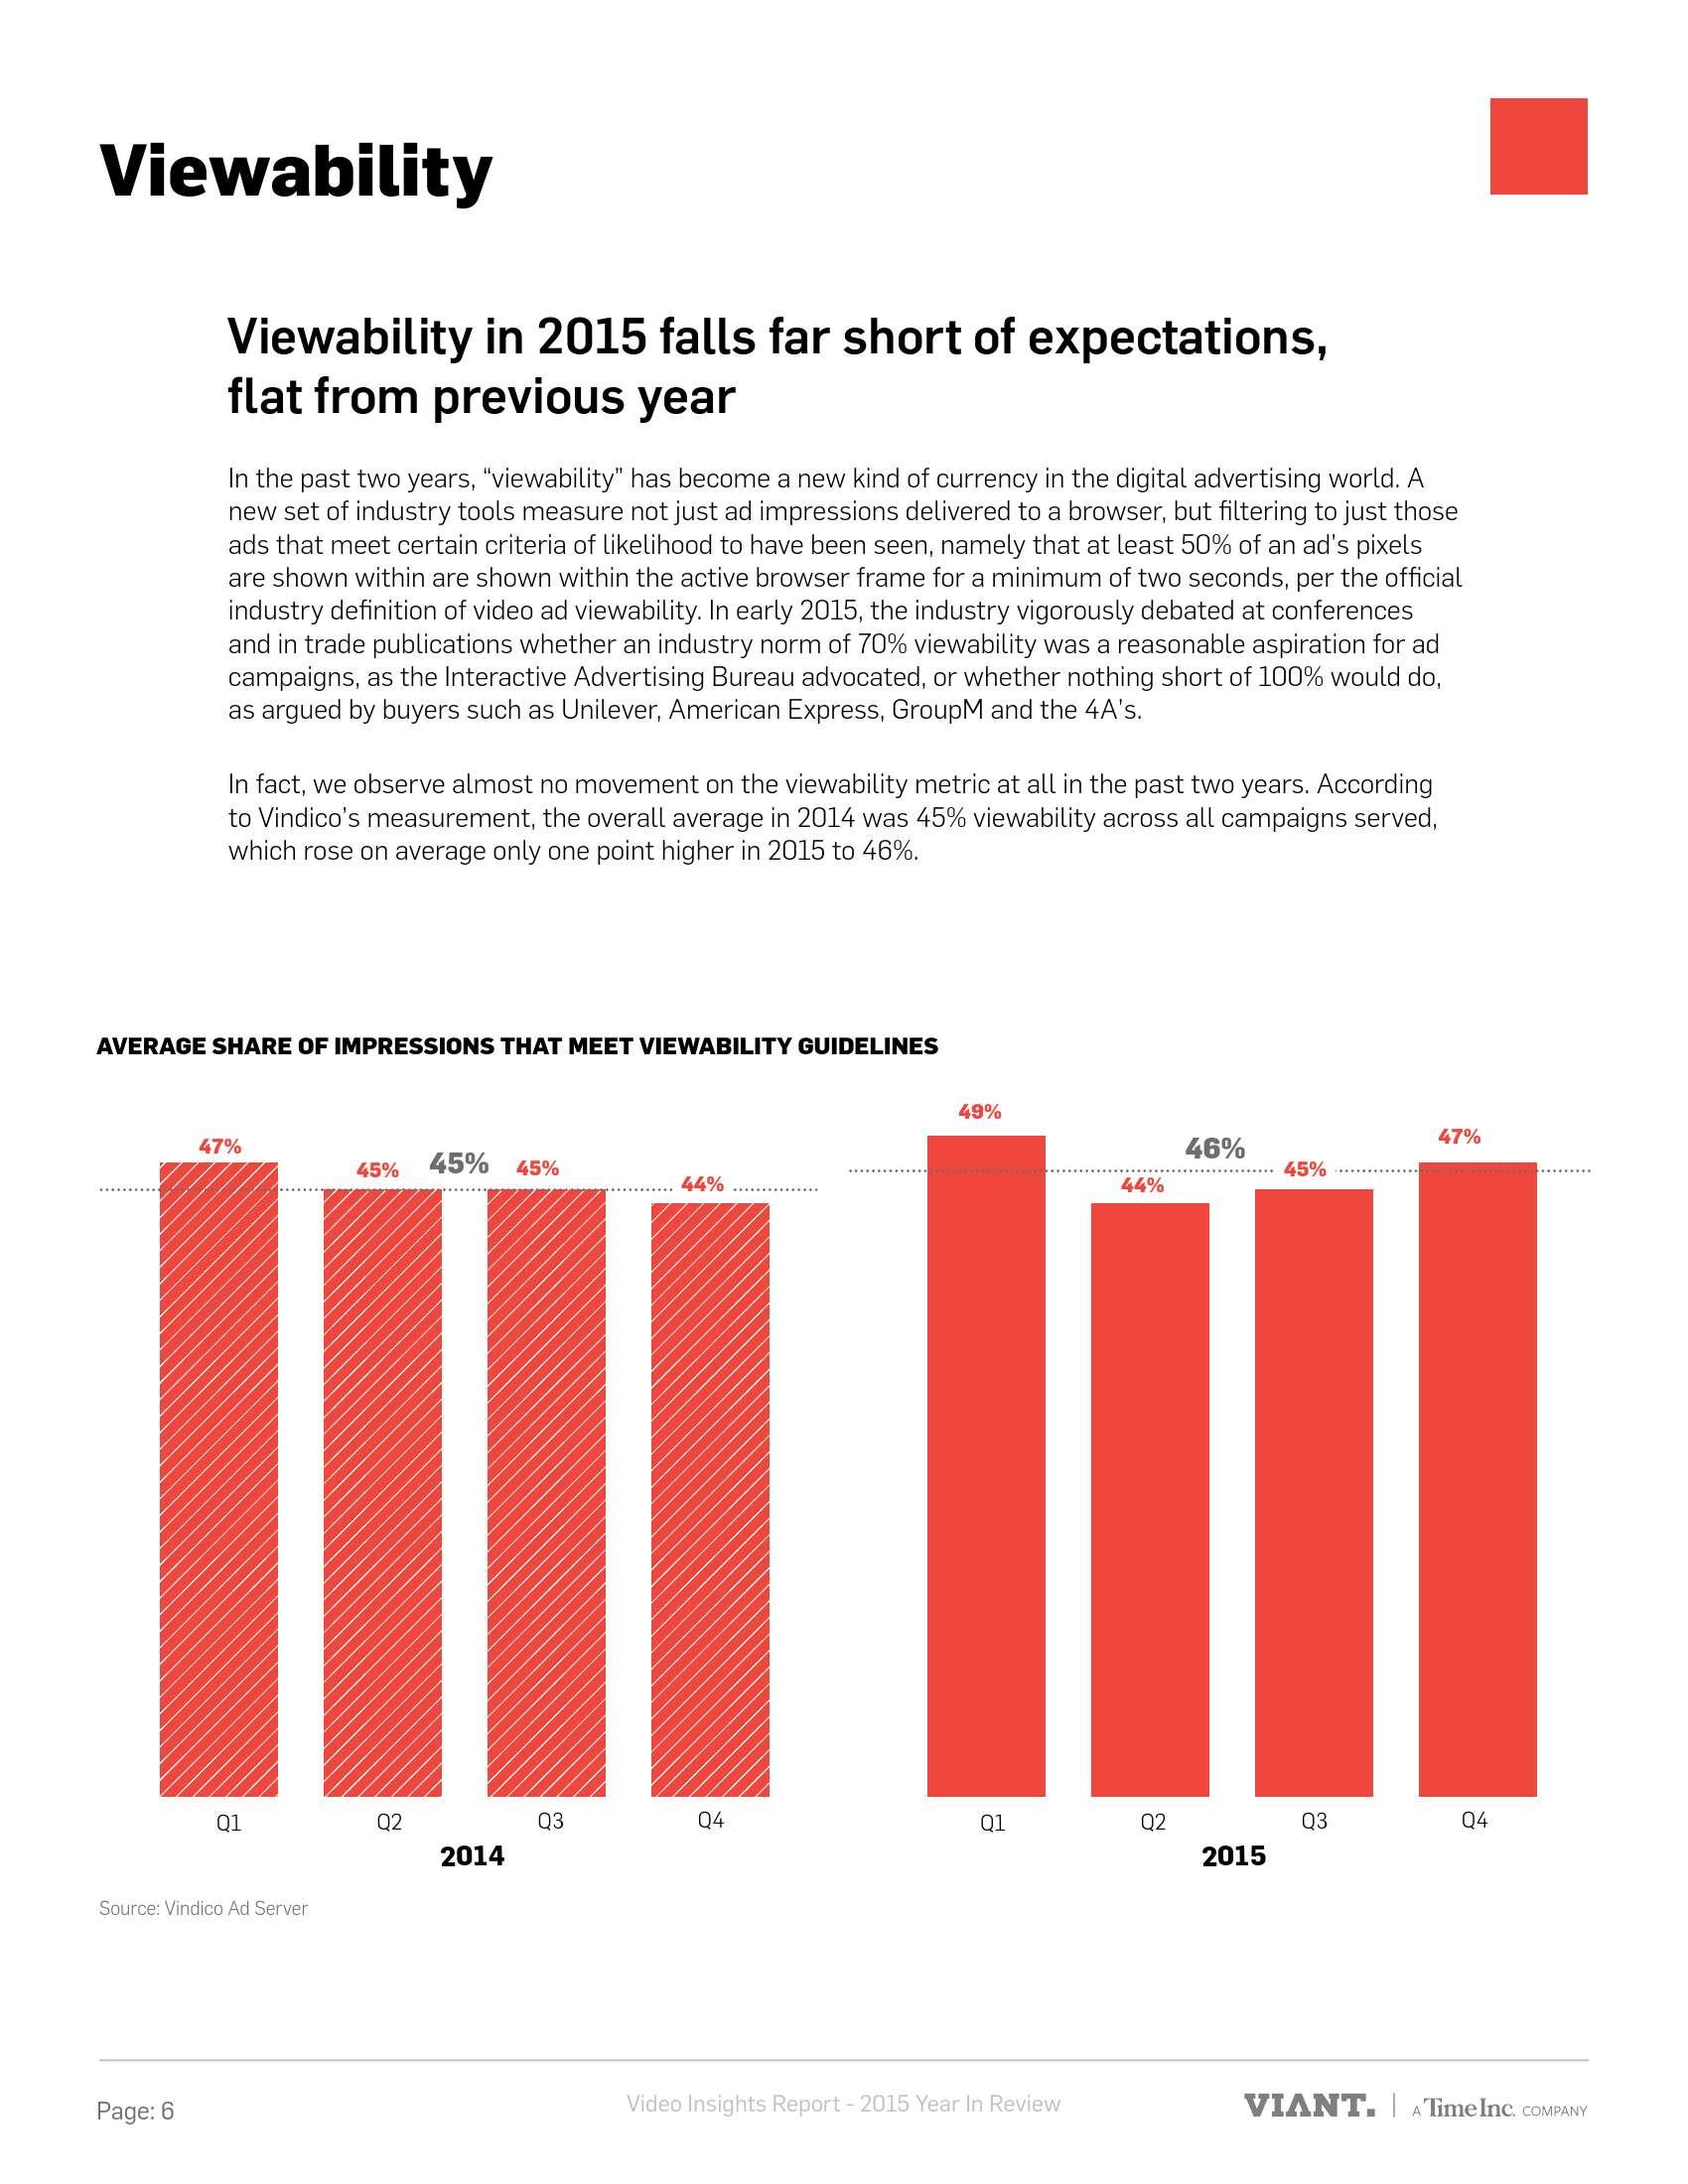 Viant:2015年视频广告趋势分析报告_000006